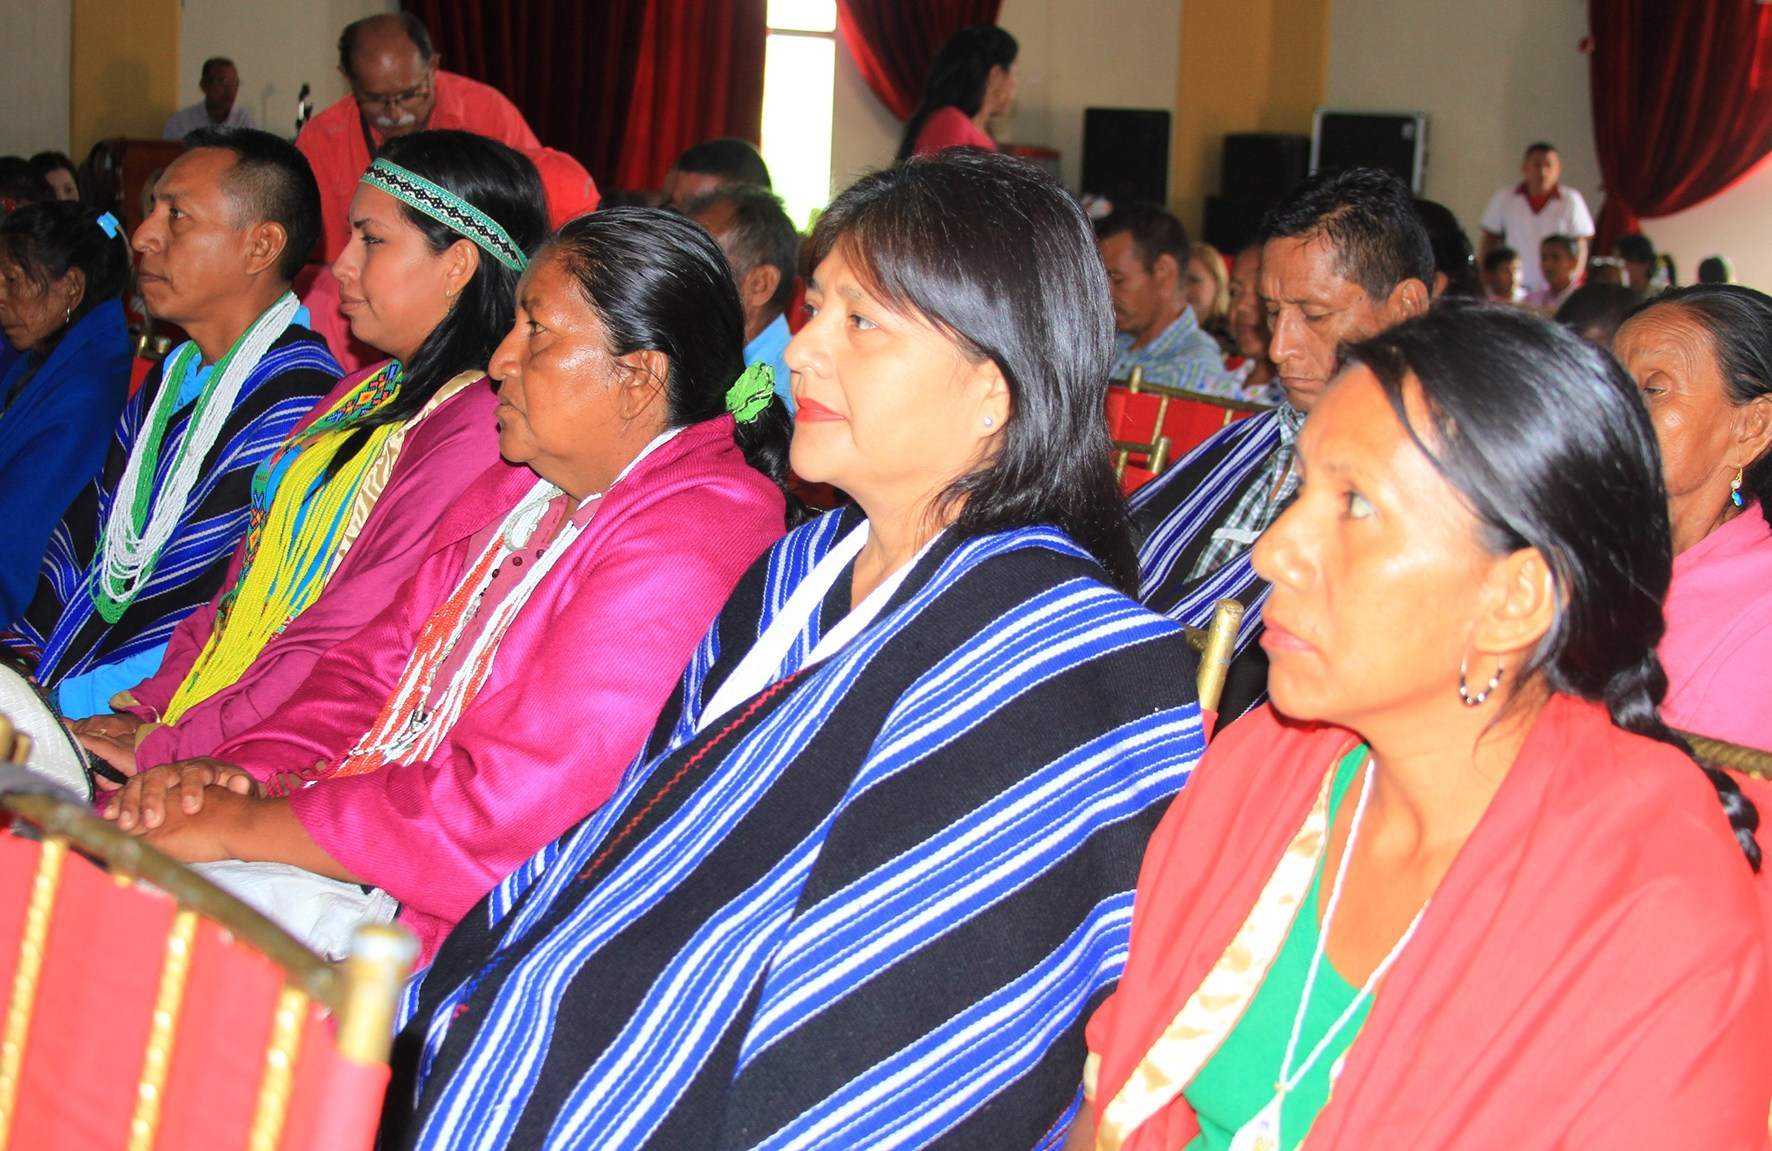 Sorprendente aumento de 188% en denuncias por discriminación en México